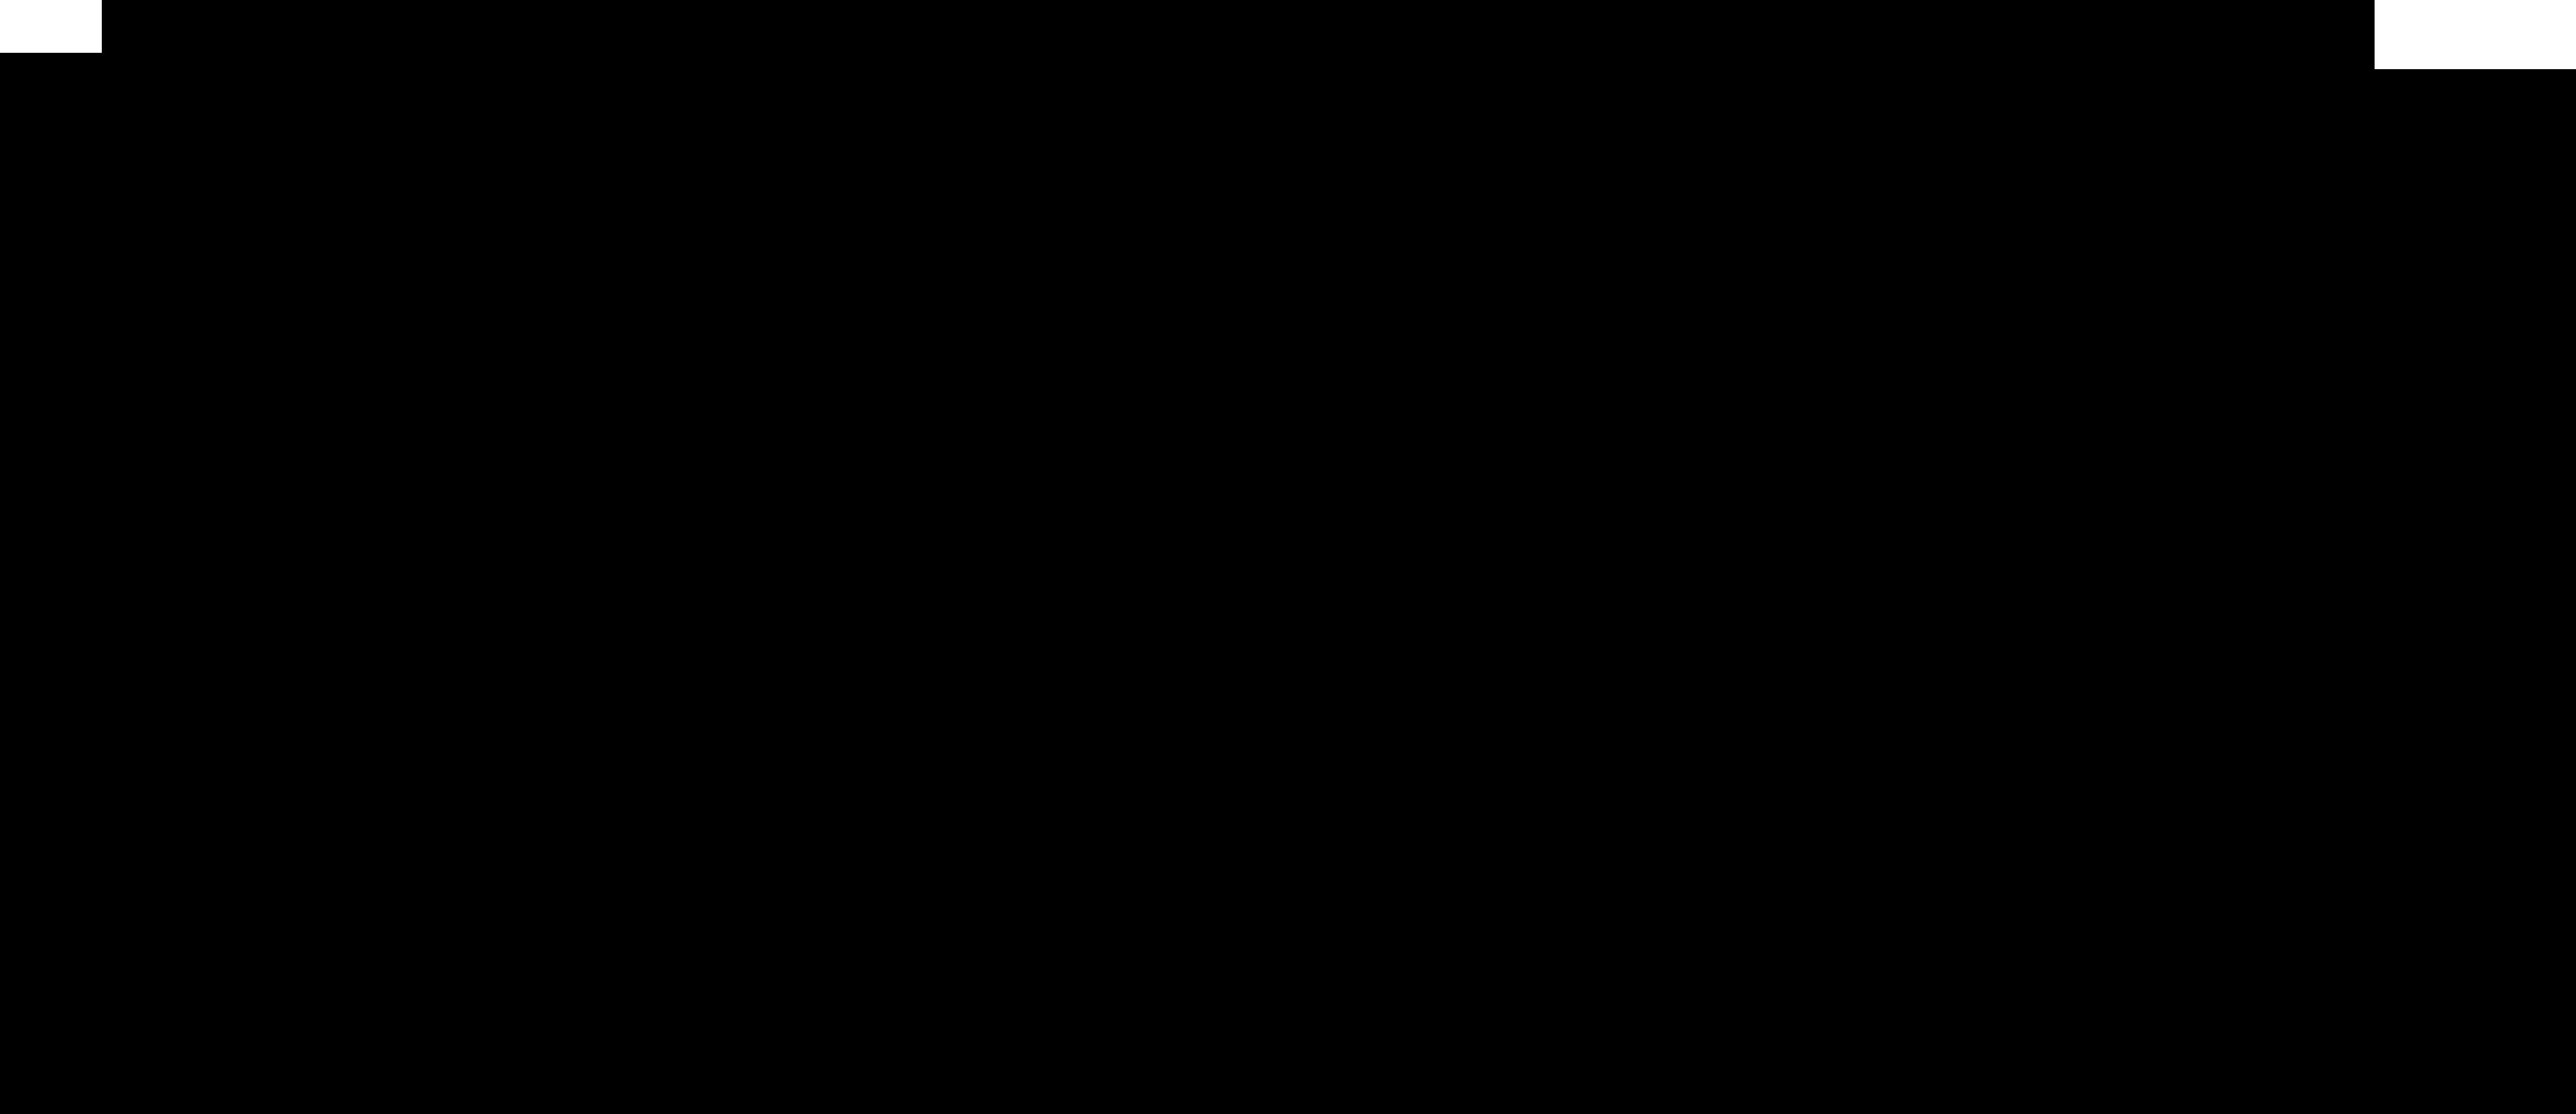 EA (Electronic Arts) – Logos Download